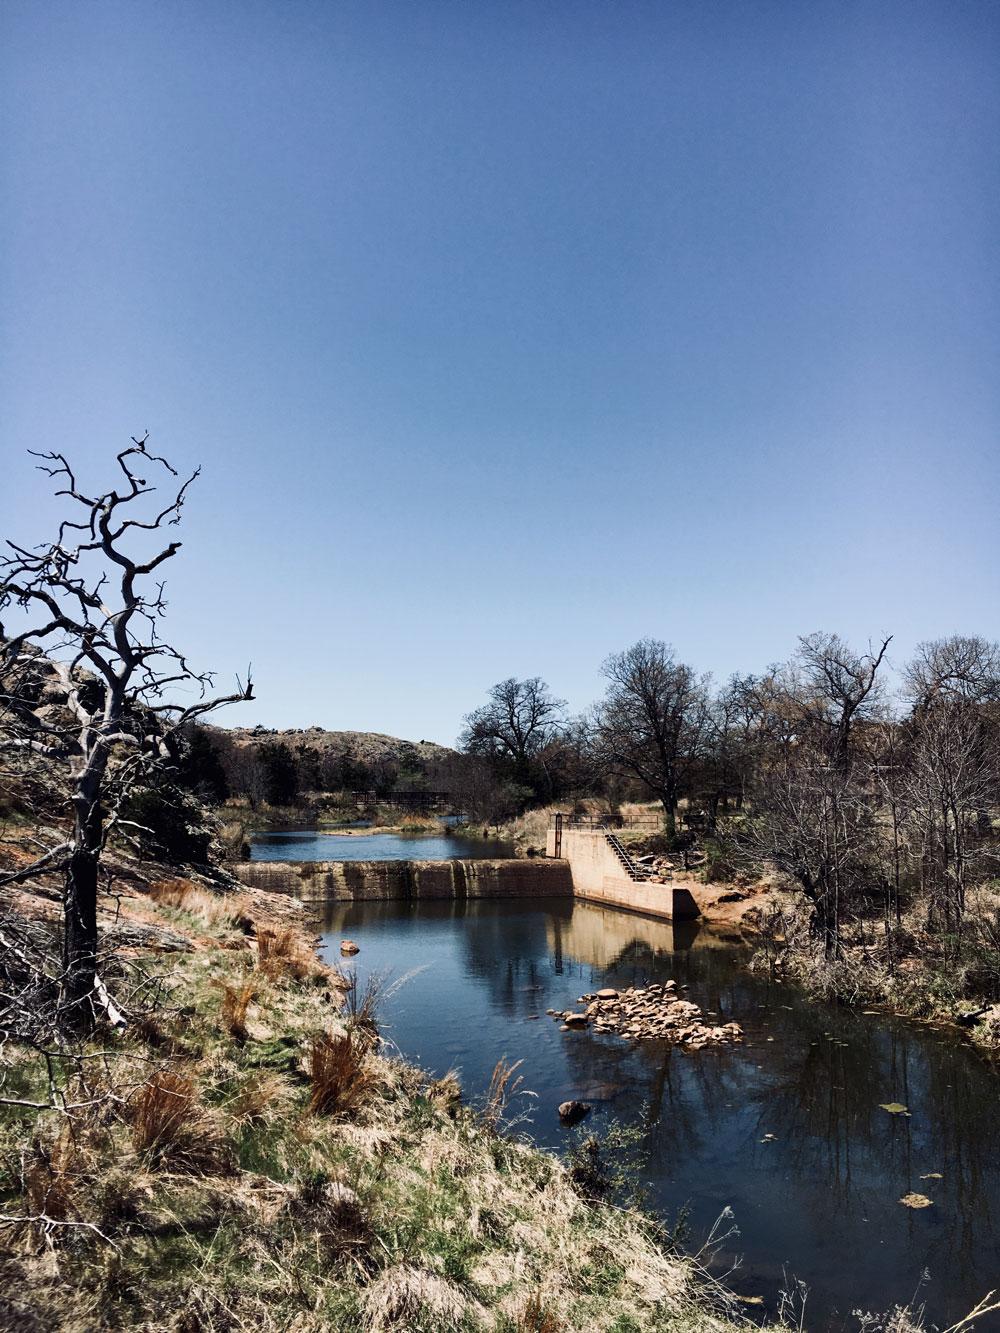 witchita mountain wildlife refuge